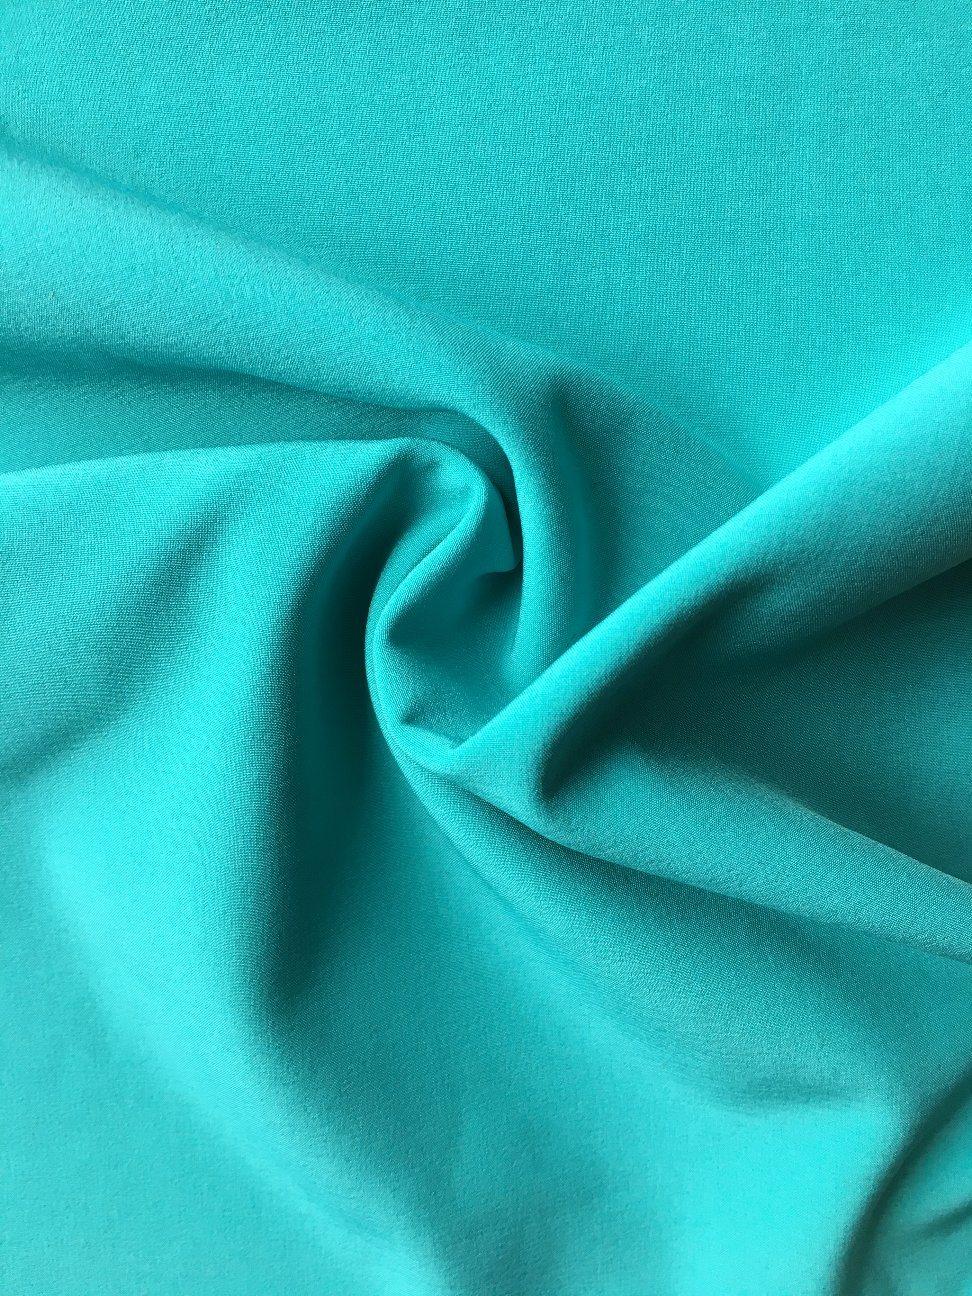 Laminated Polar Fleece Softshell Fabric 100% Polyester Stretch Fabric for Jackets